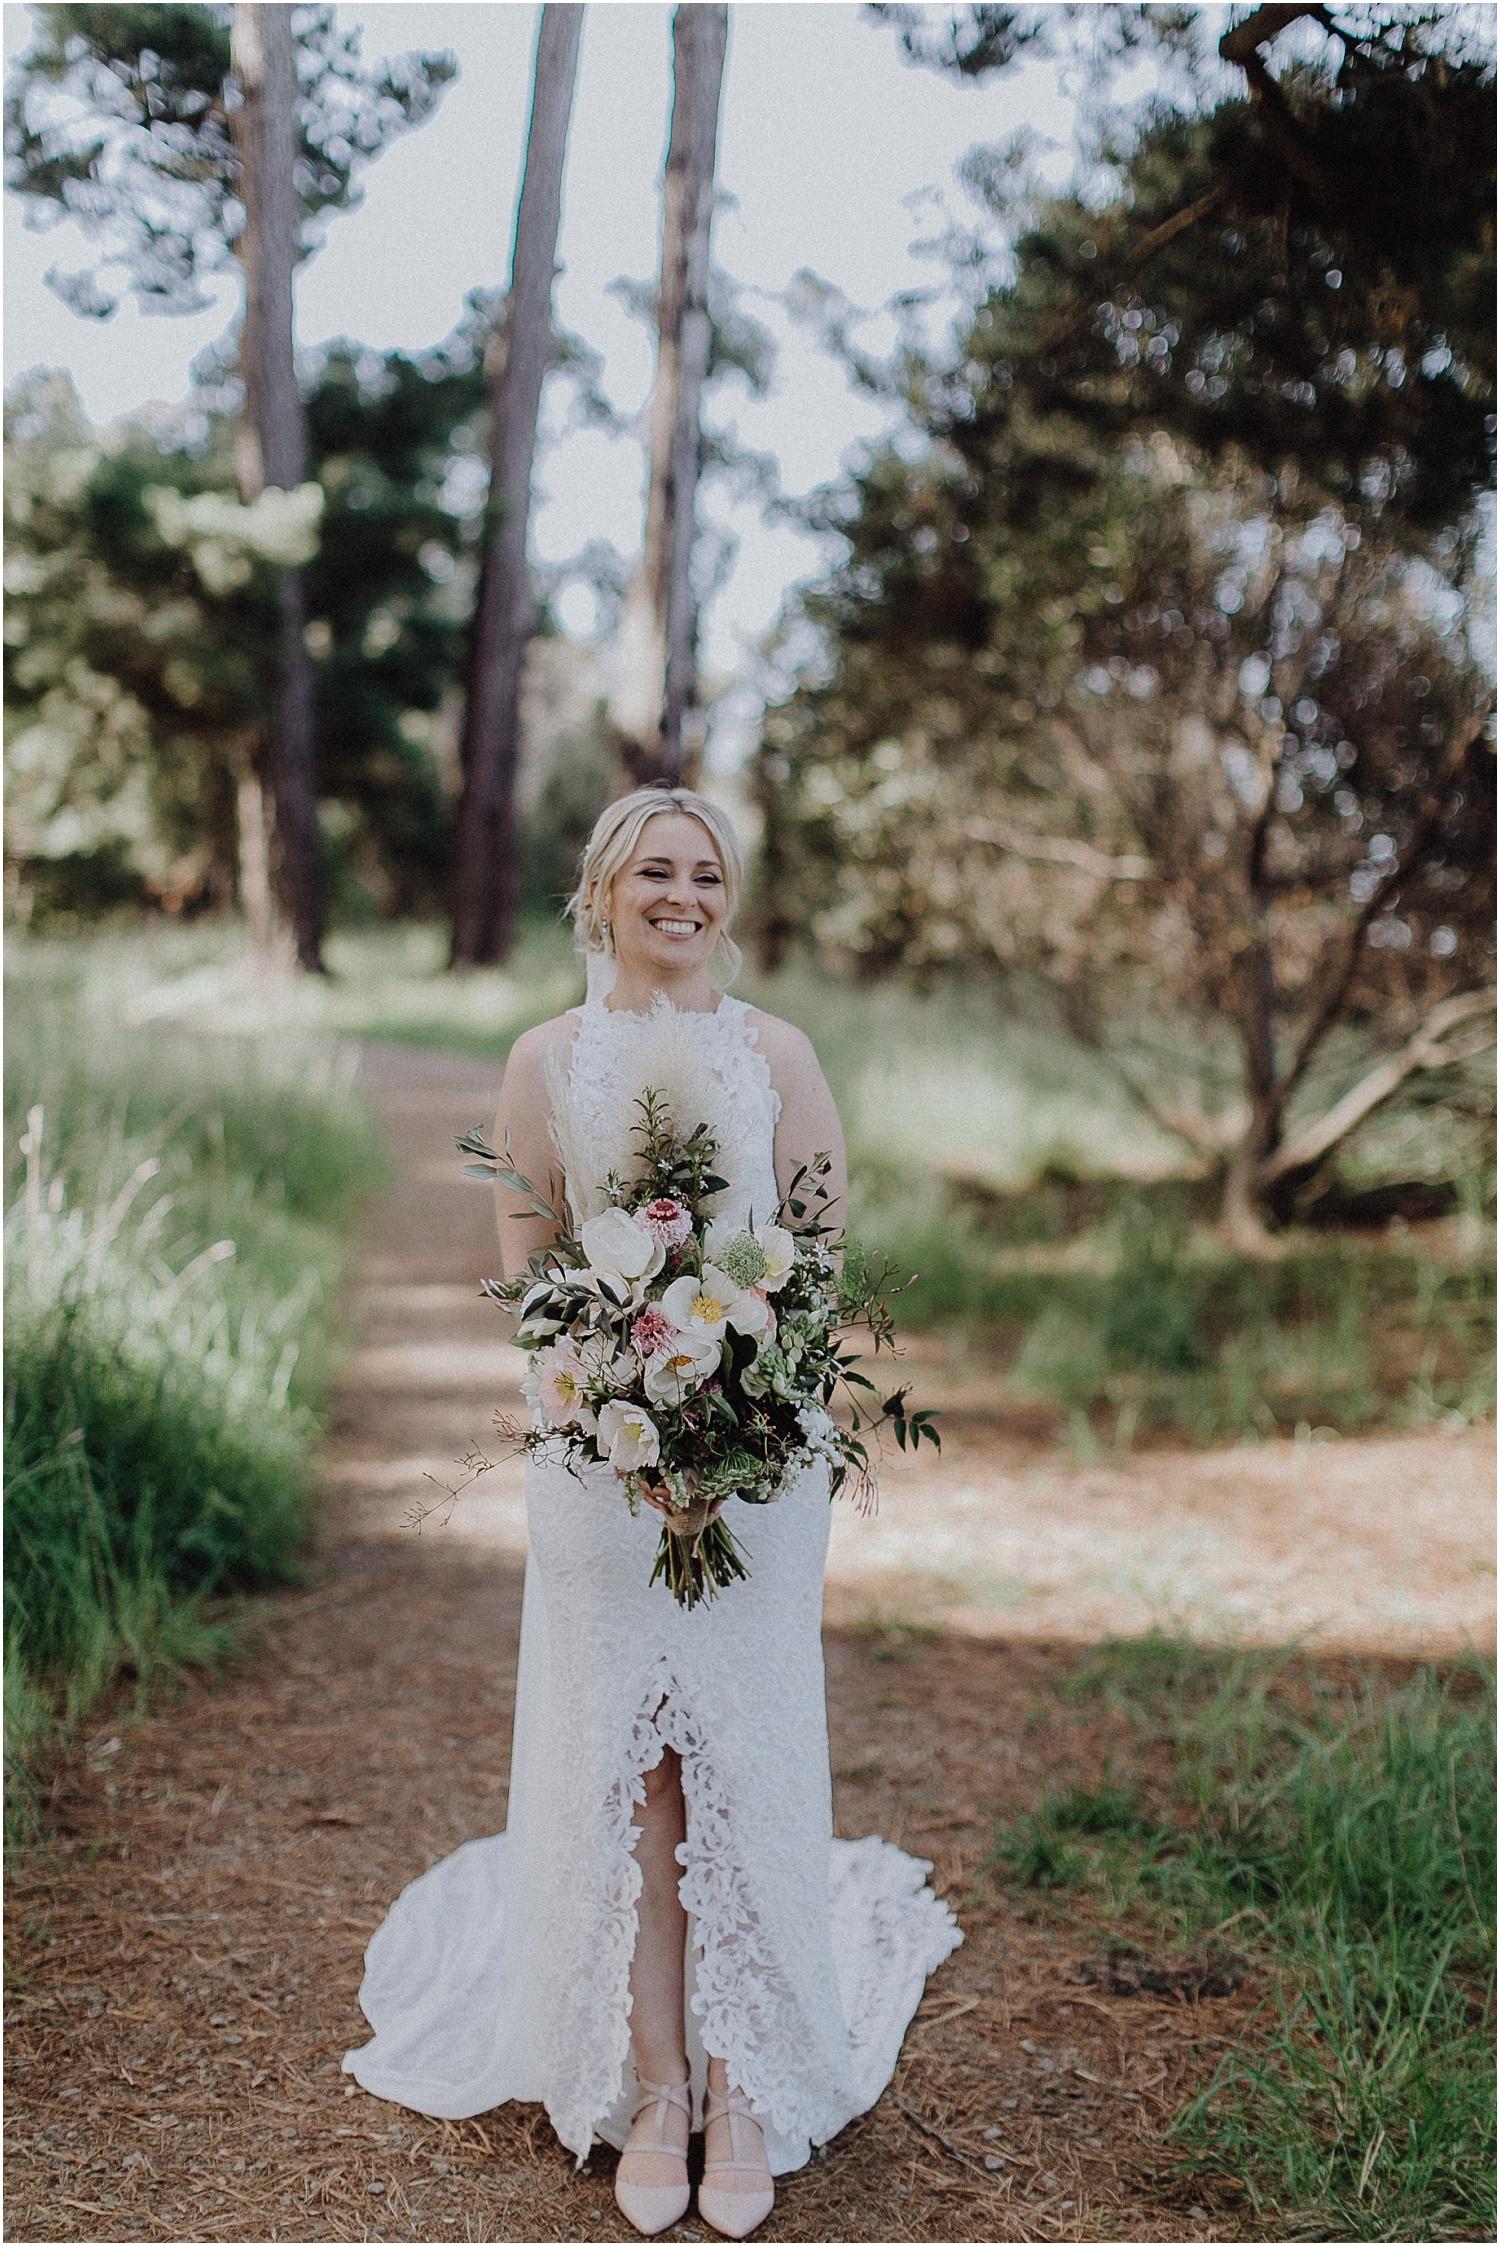 Nicolle and Damien's tipi wedding at the Flinders Yacht Club on the Mornington Peninsula._0129.jpg